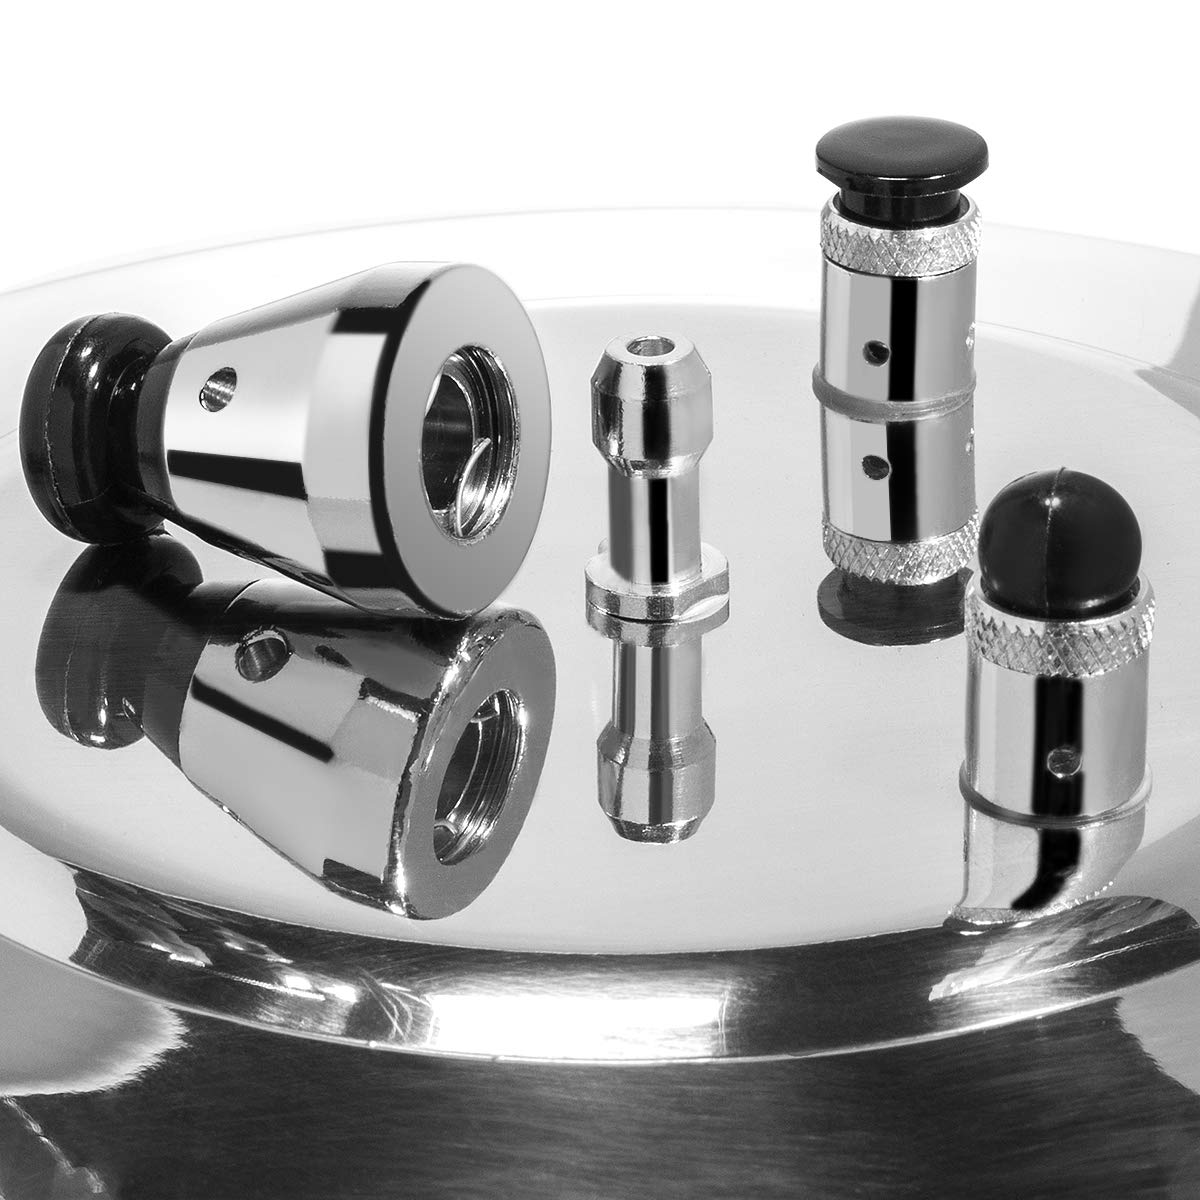 Barton 8-Quart Aluminum Pressure Cooker Stovetop Fast Cooker Pot Pressure Regulator Fast Cooking Steam Release Valve by Barton (Image #4)